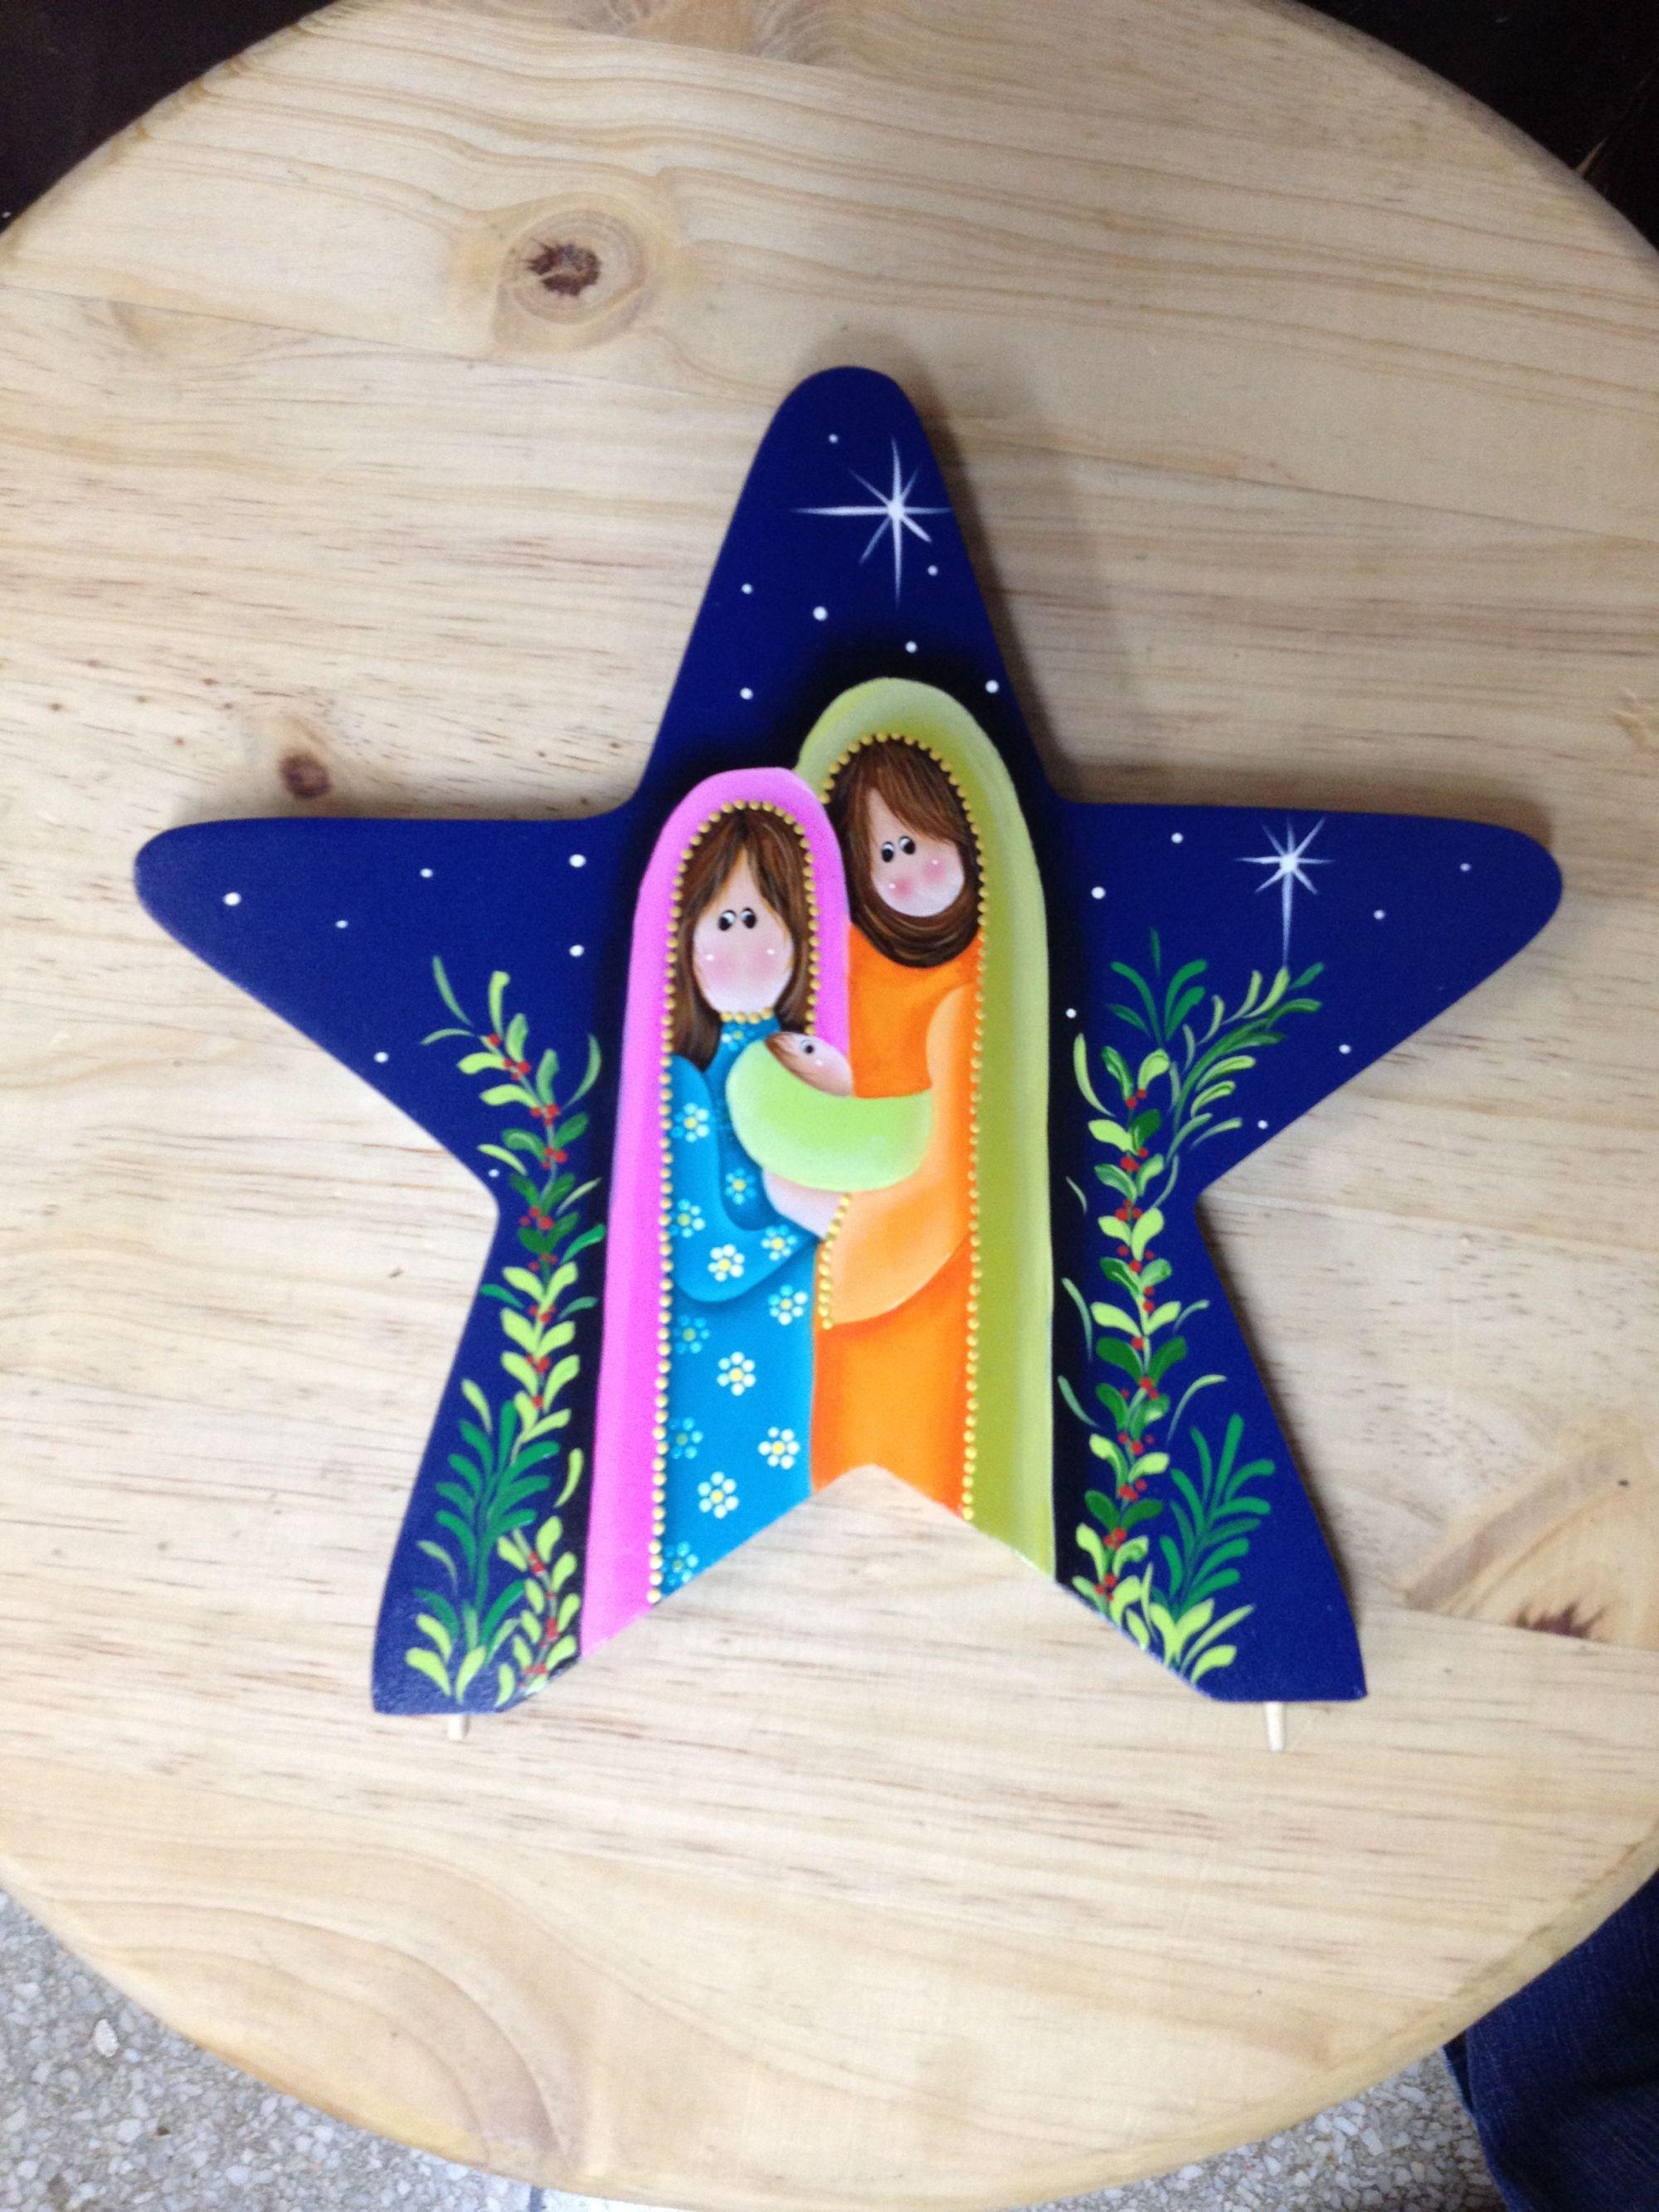 hight resolution of nativity scene on star